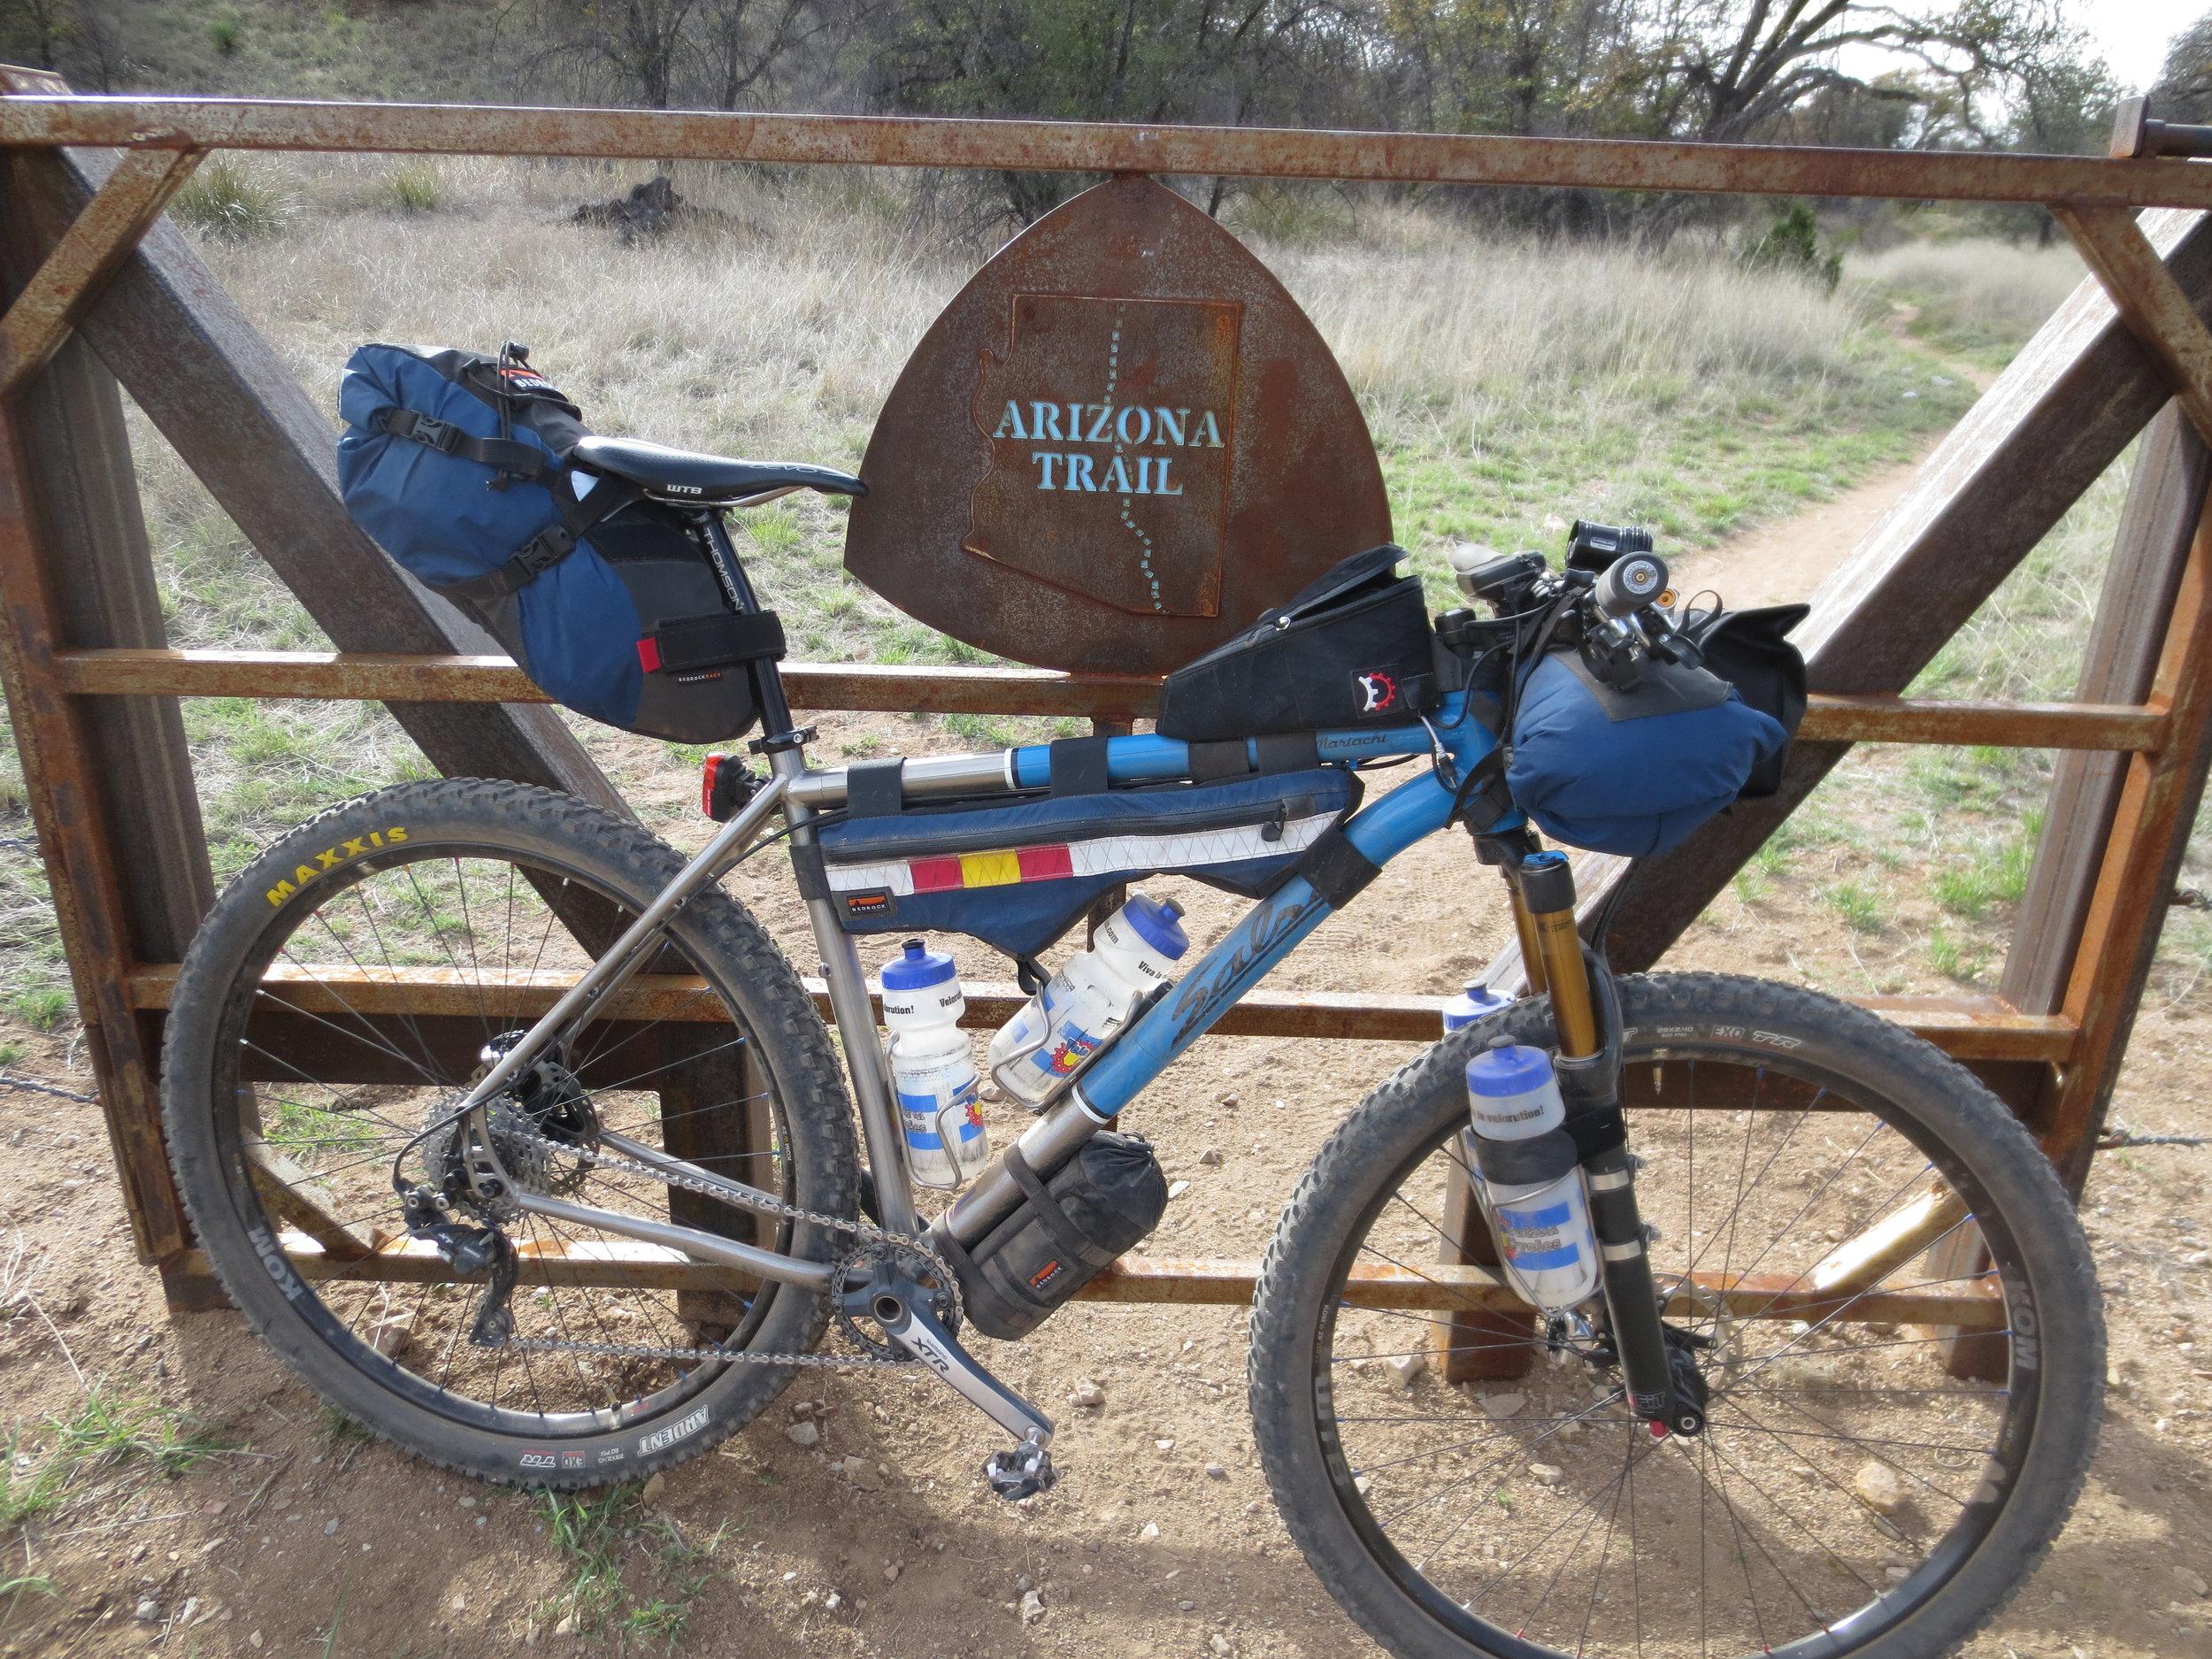 Joey's bike during the 2015 Arizona Trail Race